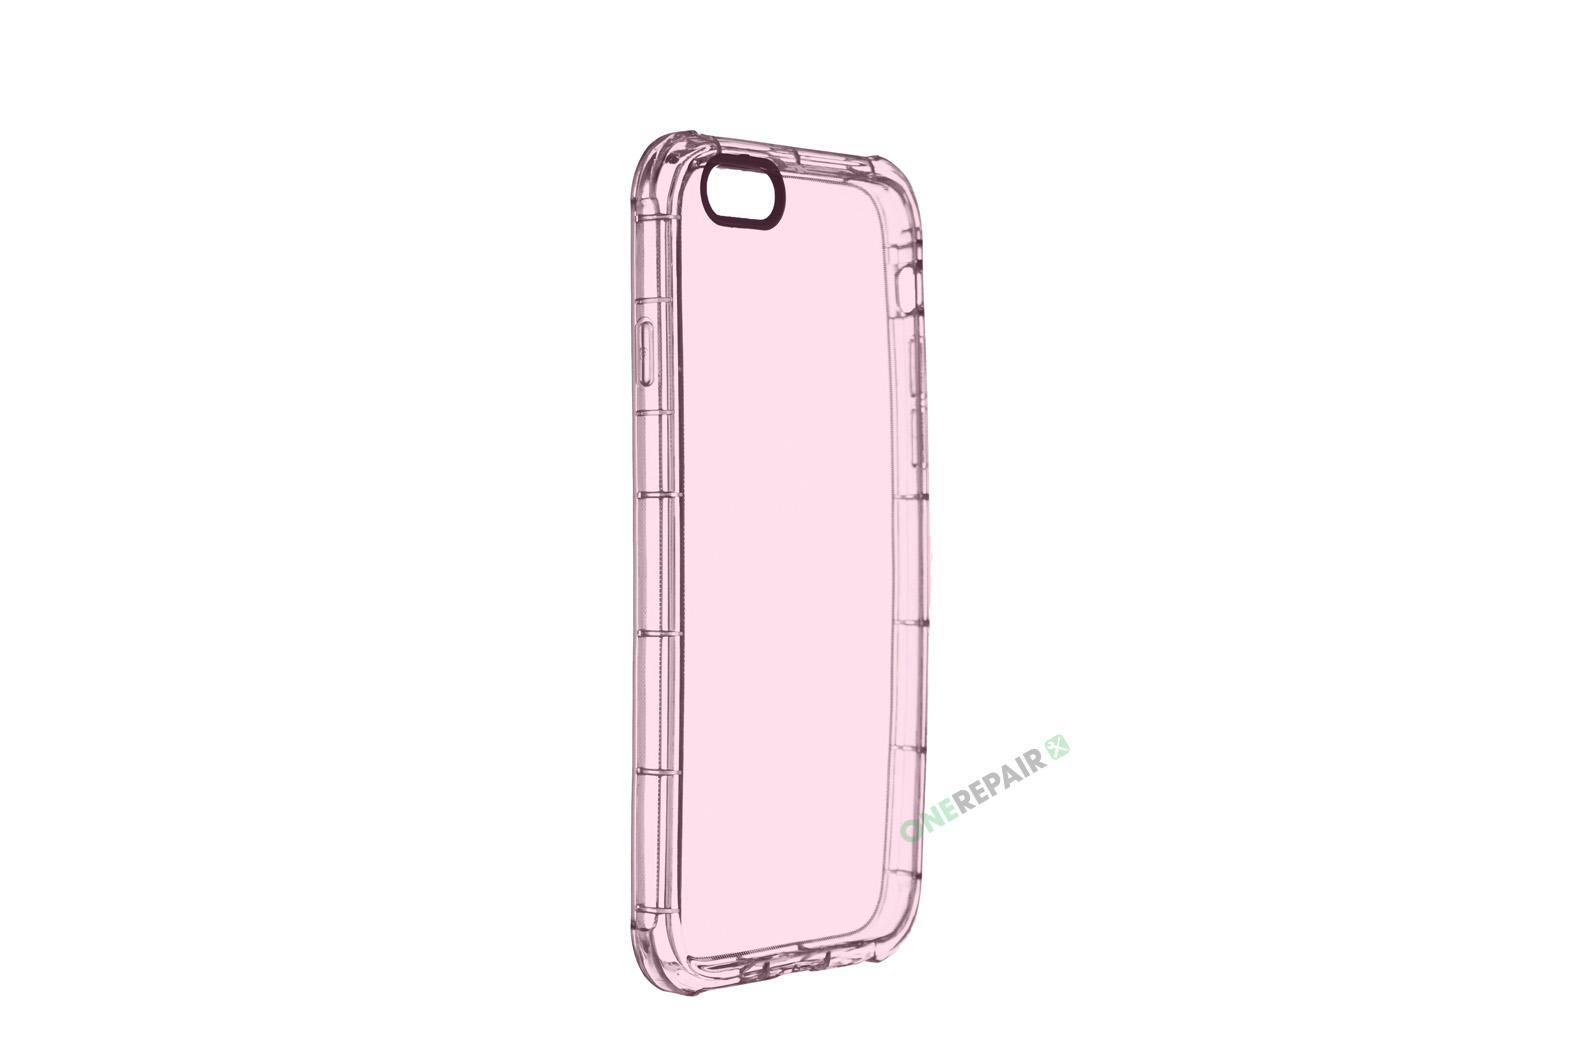 350566_iPhone_6_6s_Thick_Gummicover_Gennemsigtig_Pink_Lyseroed_Gummi_Cover_Bagcover_Billig_OneRepair_WM_00002